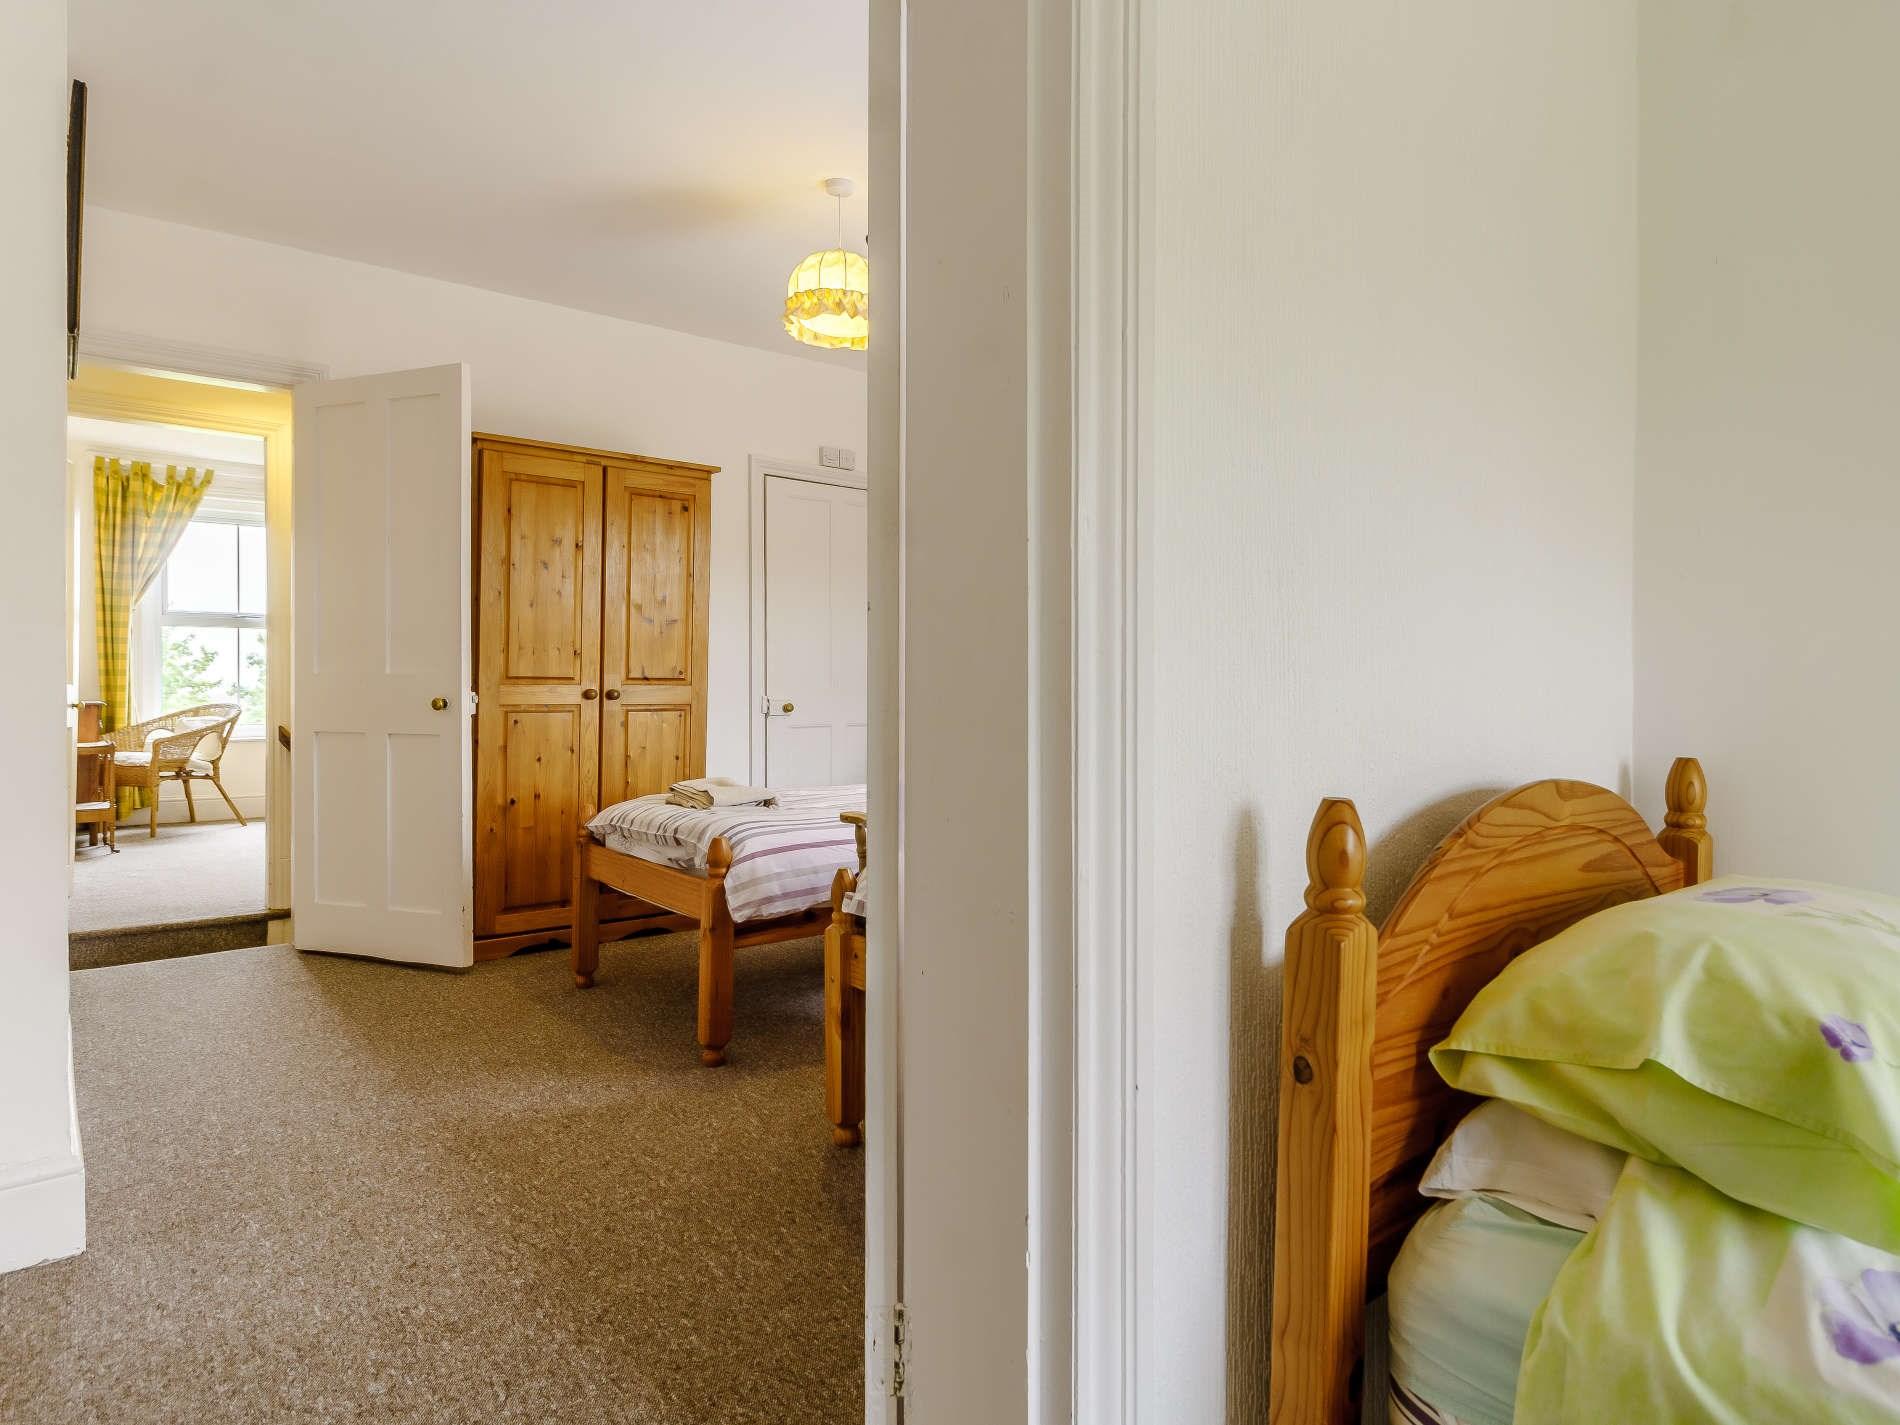 3 Bedroom Cottage in Norfolk, East Anglia